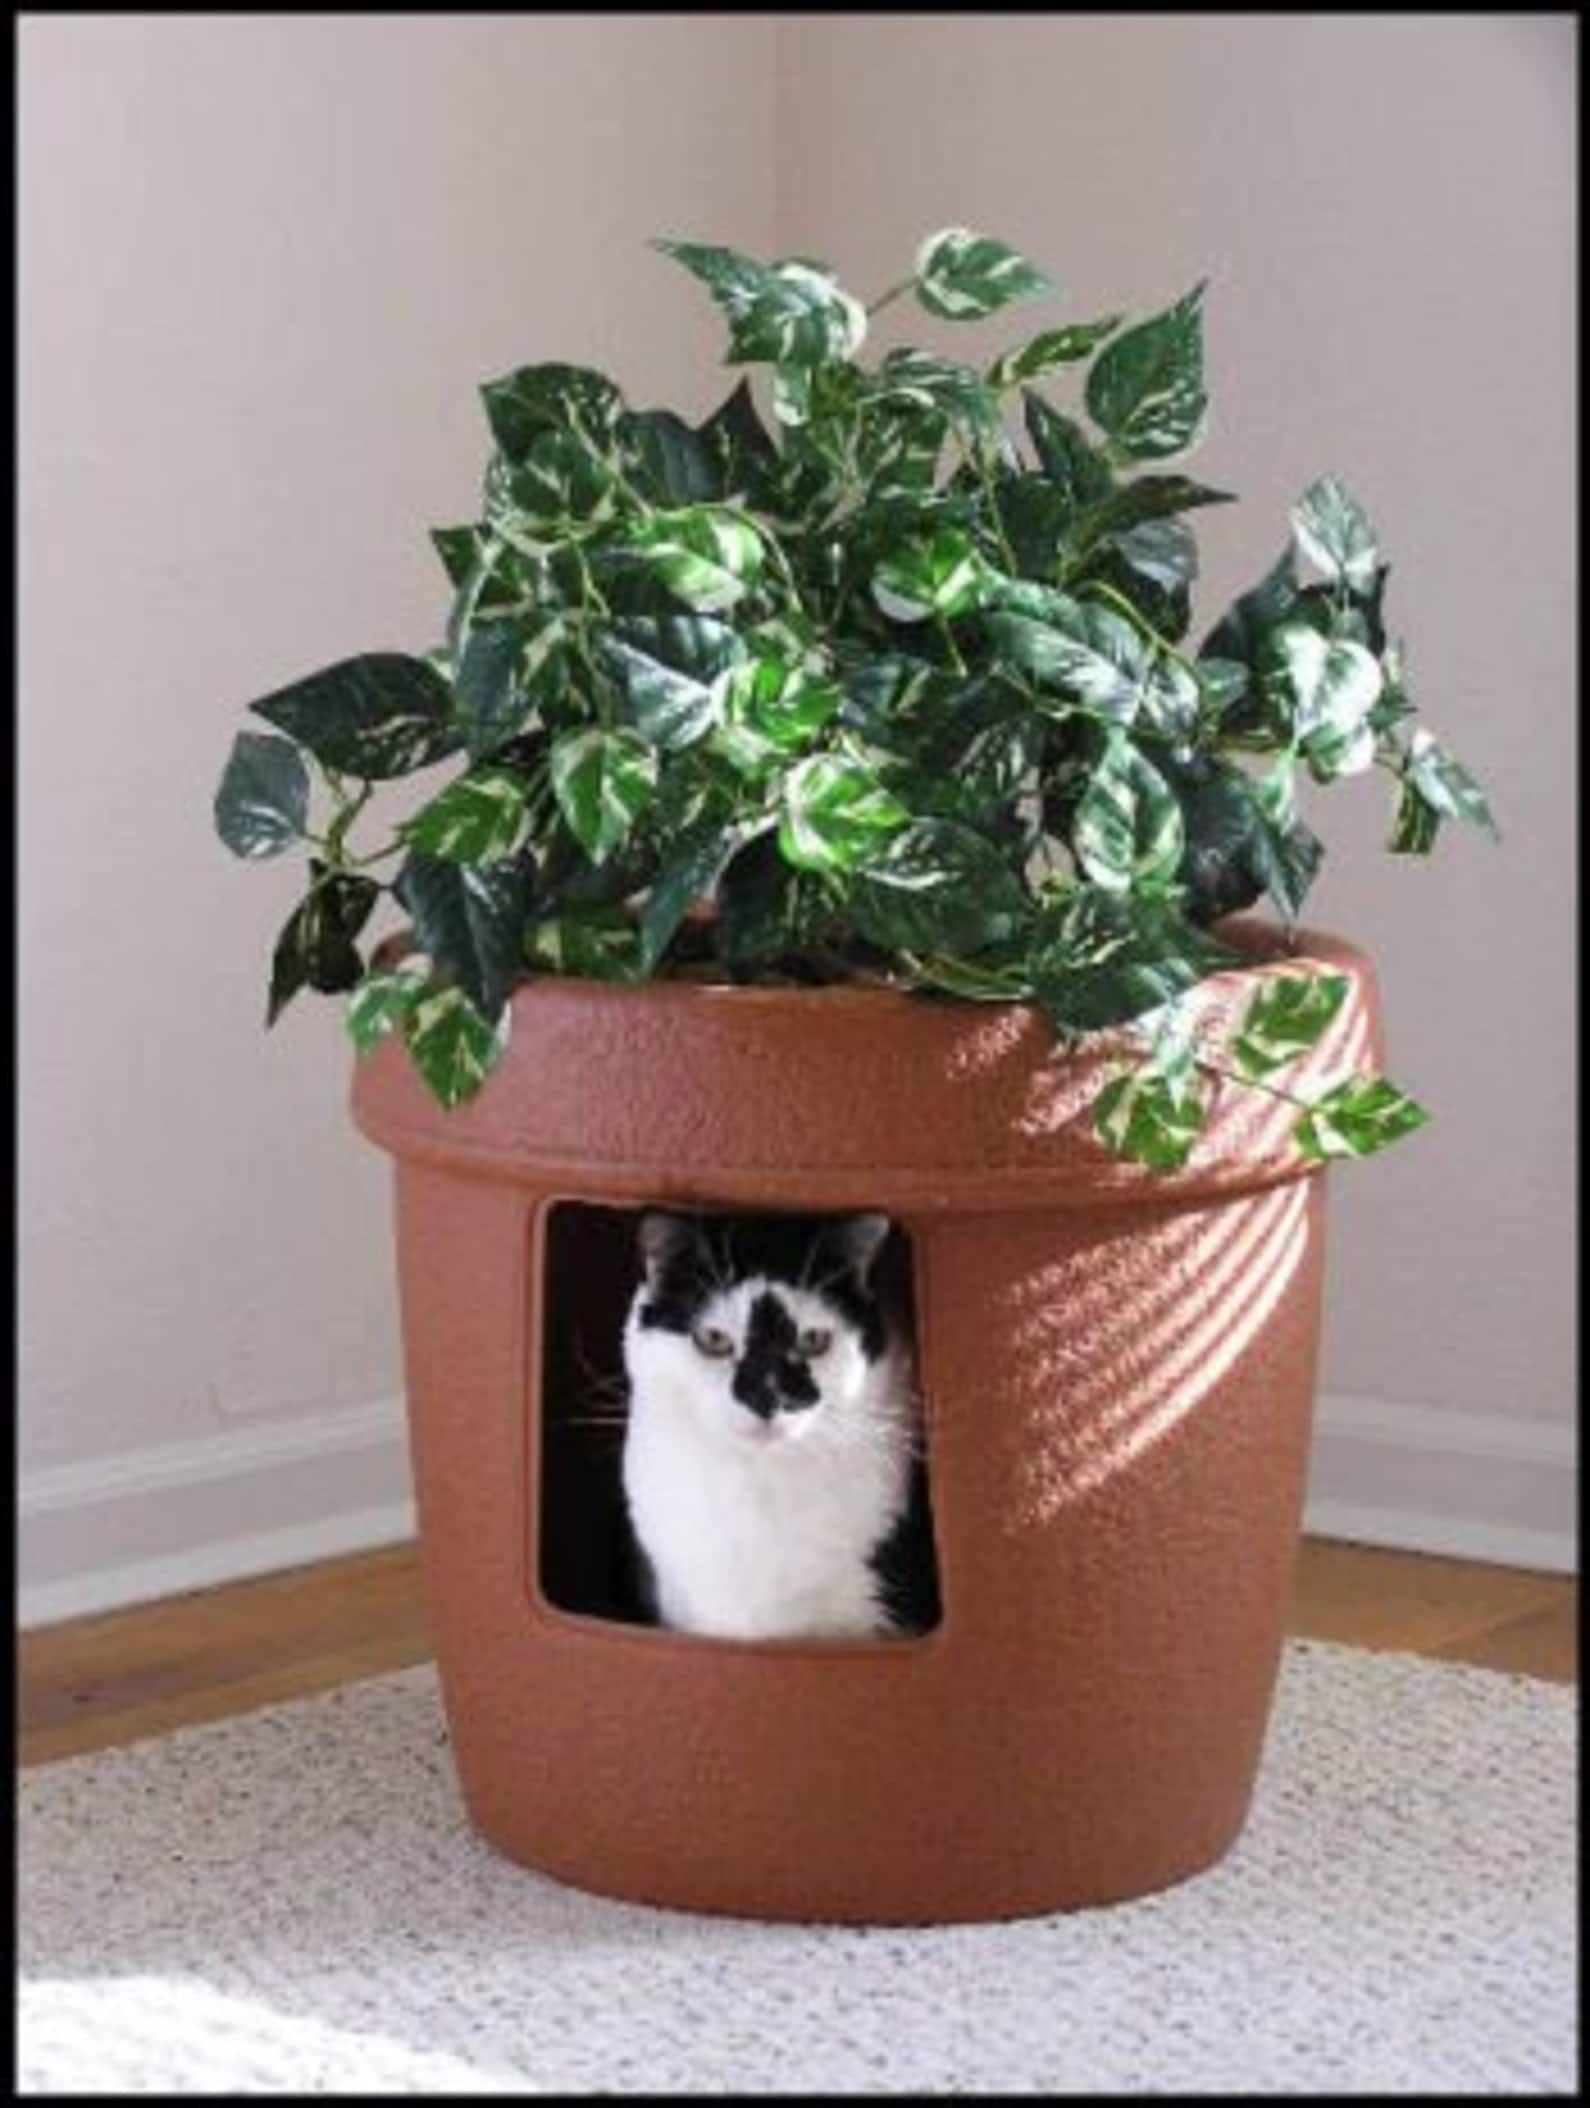 10 ideas for disguising or hiding a litter box cat